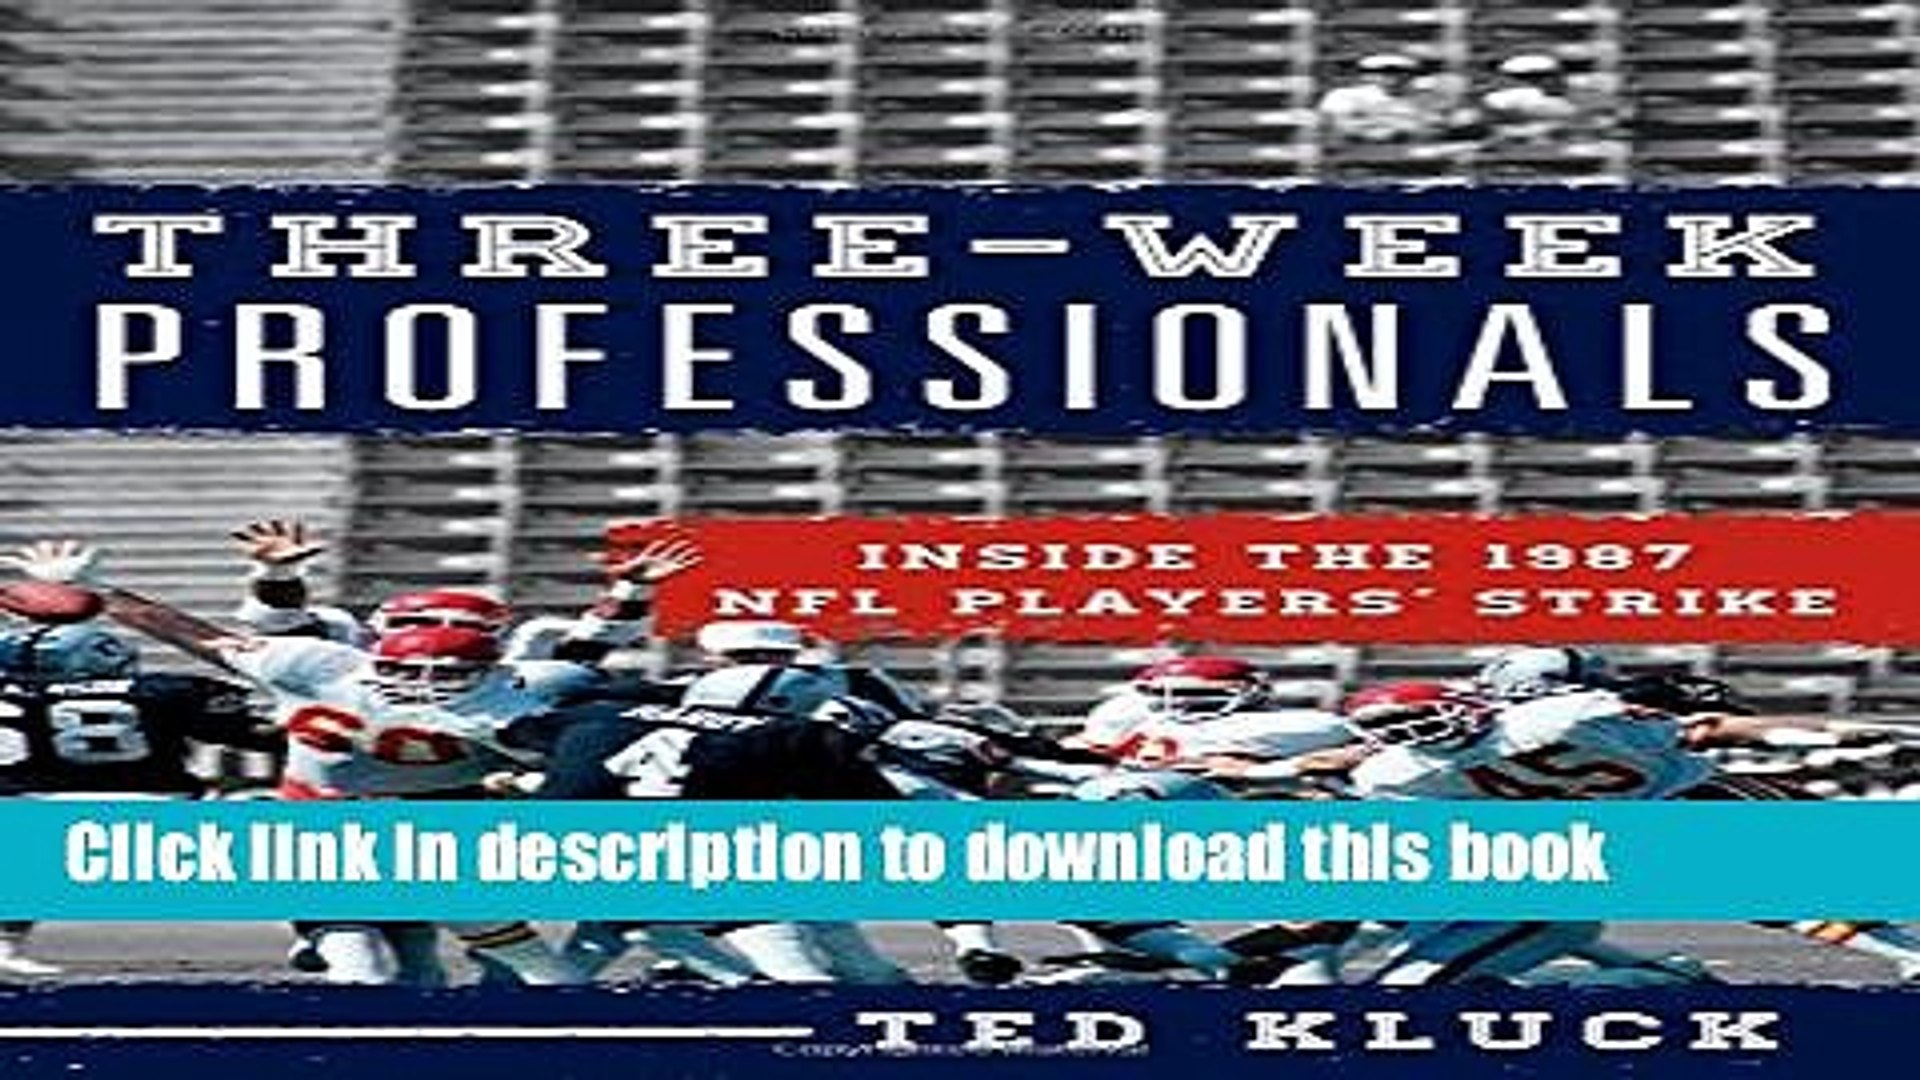 [PDF] Three-Week Professionals: Inside the 1987 NFL Players  Strike Read Online